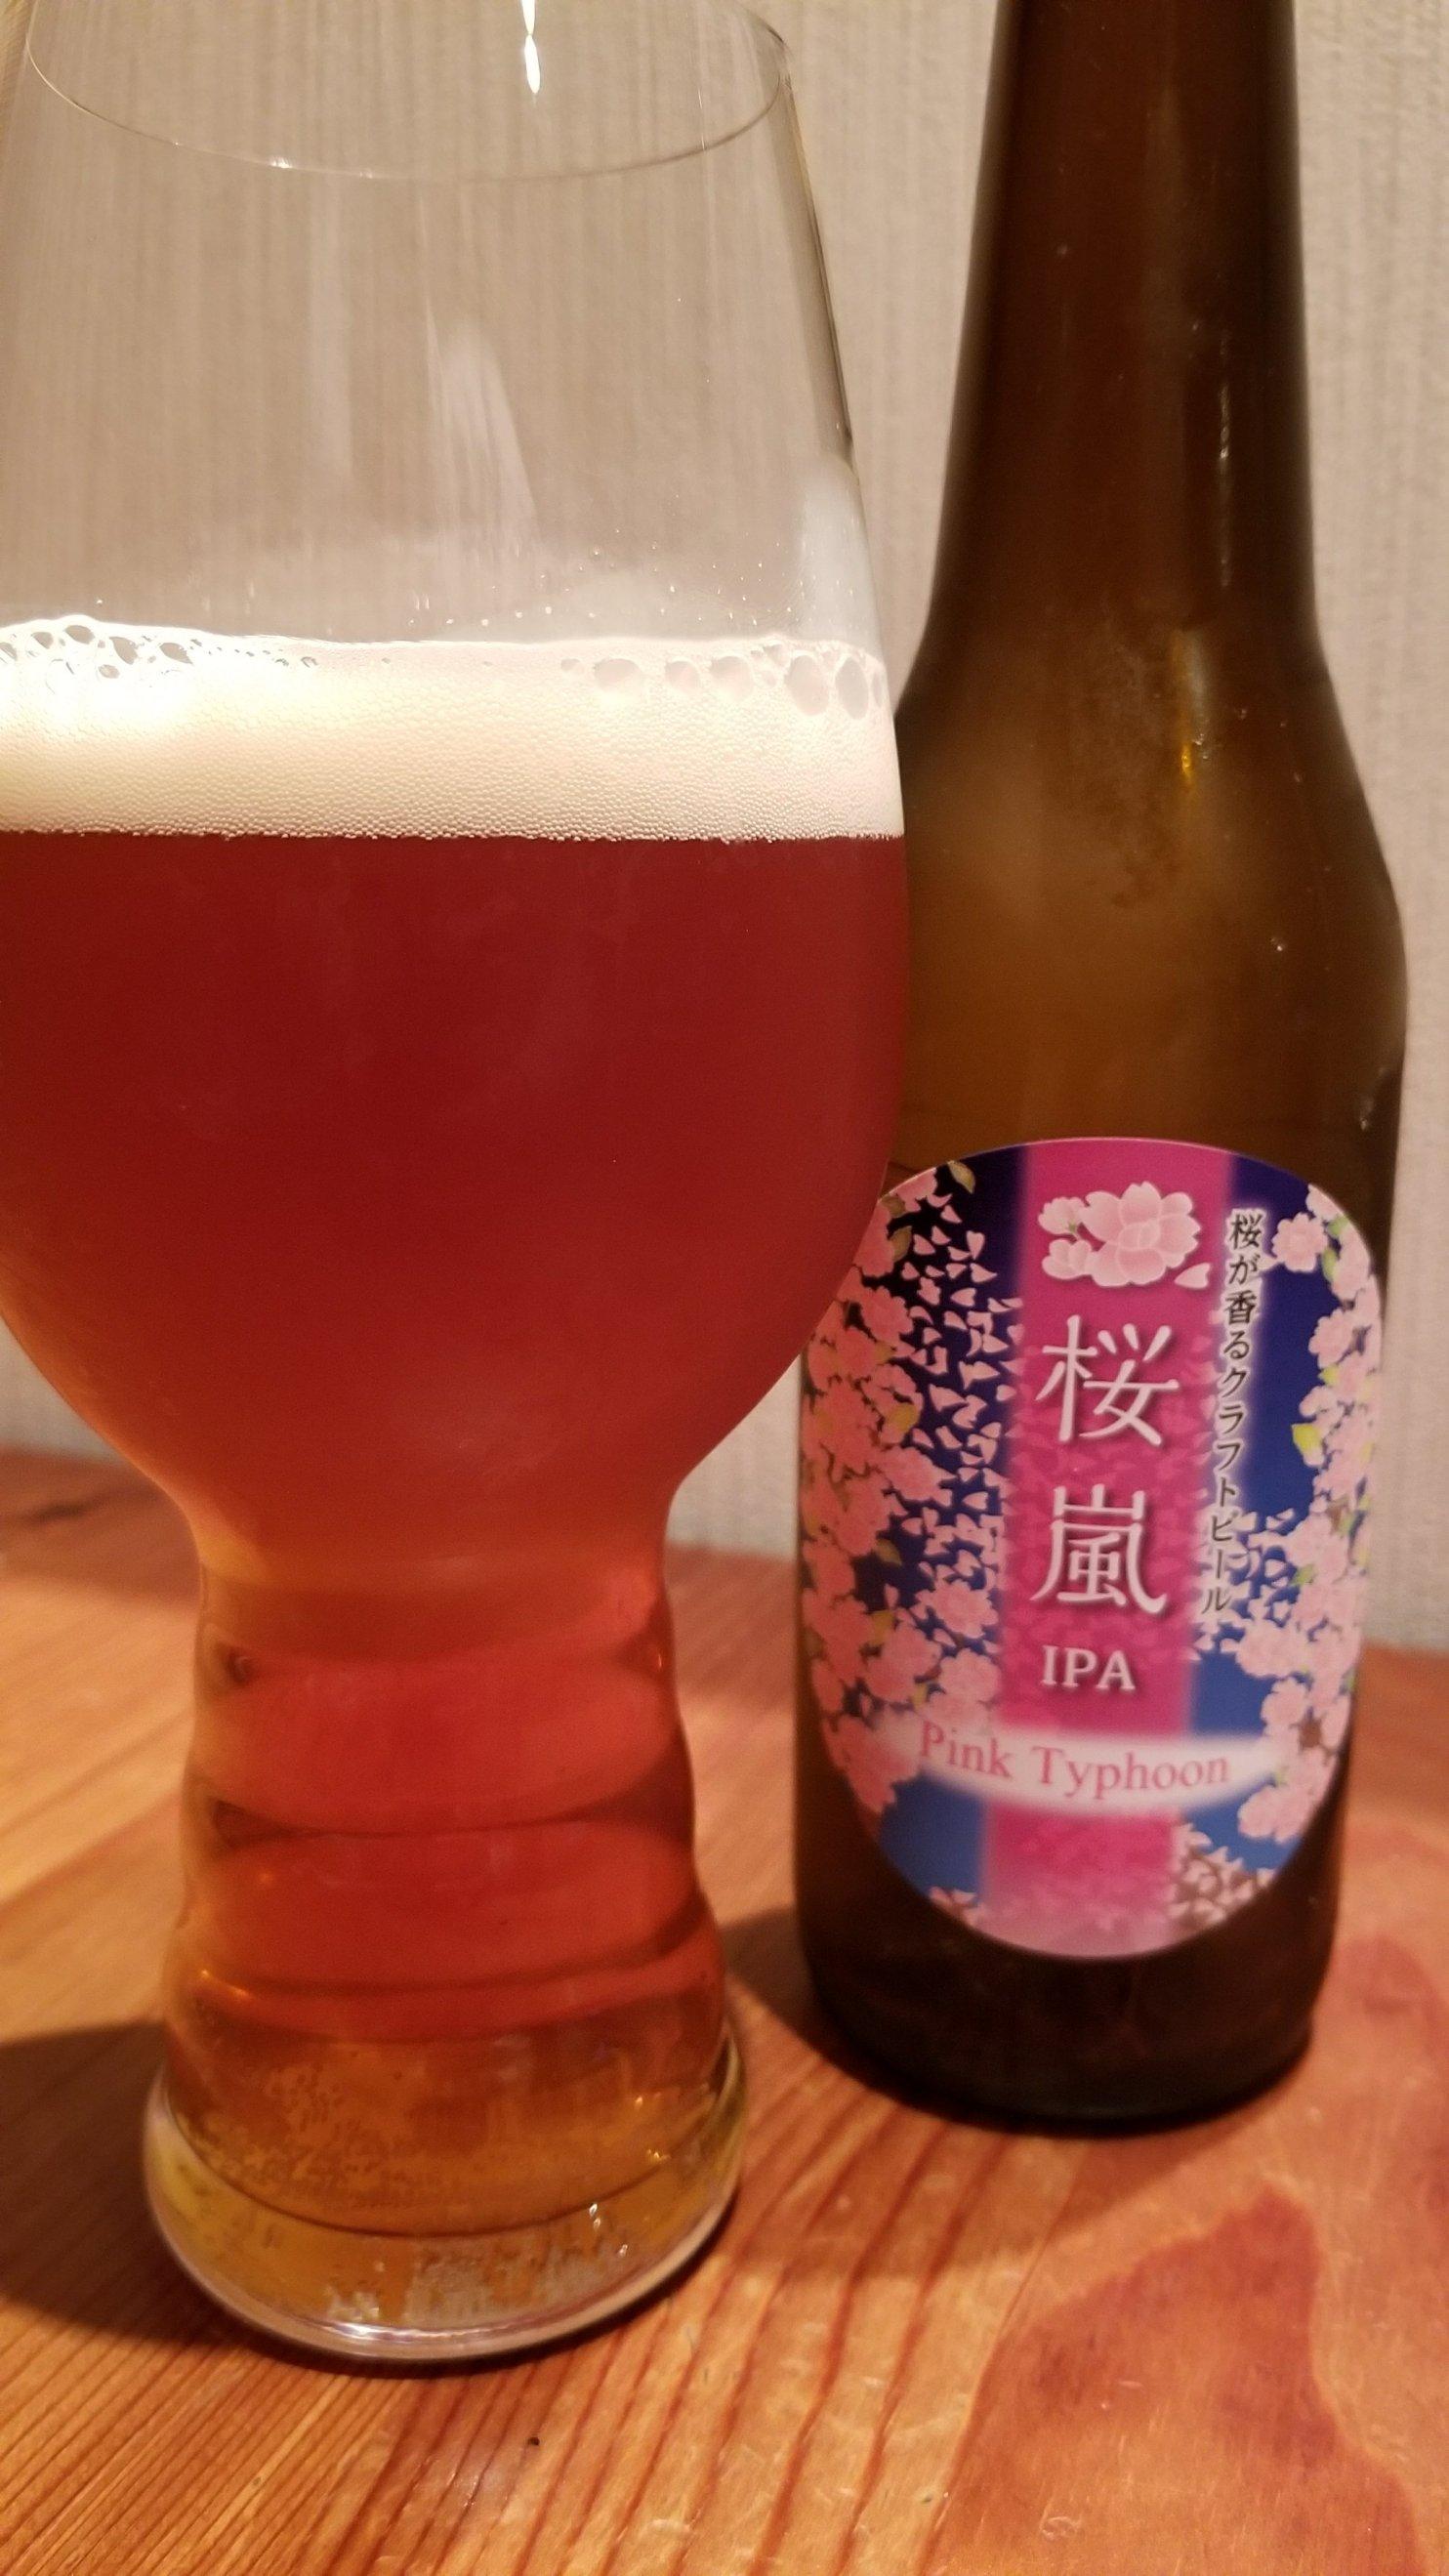 Iwate Kura Pink Typhoon いわて蔵桜風